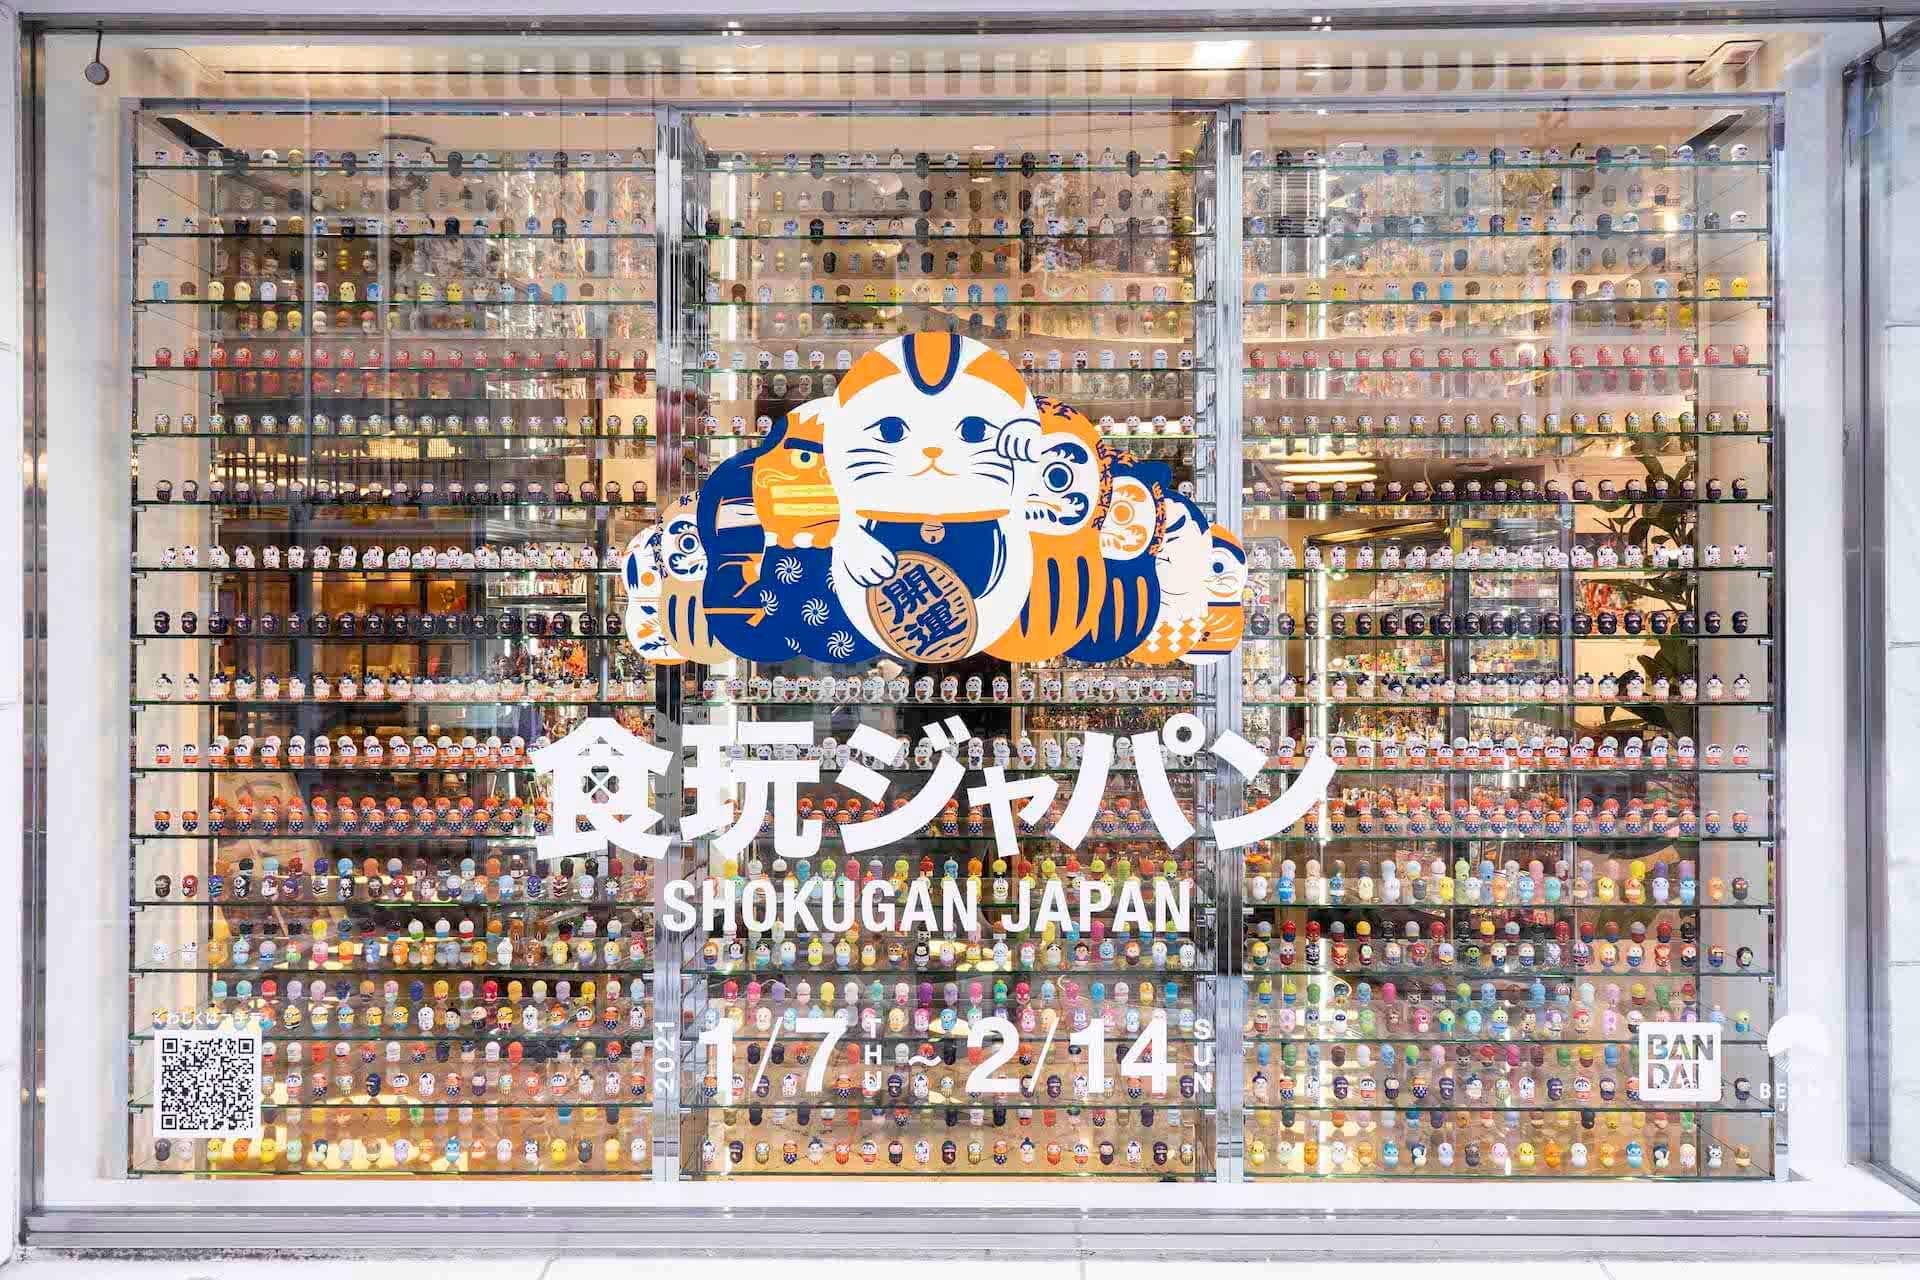 "BEAMS JAPANとバンダイが""食玩""の魅力を発信する新プロジェクトを始動!錦鯉、ラランドら出演の漫才動画や限定デザインの『クーナッツ』など展開 art210108_shokuganjapan_2-1920x1280"